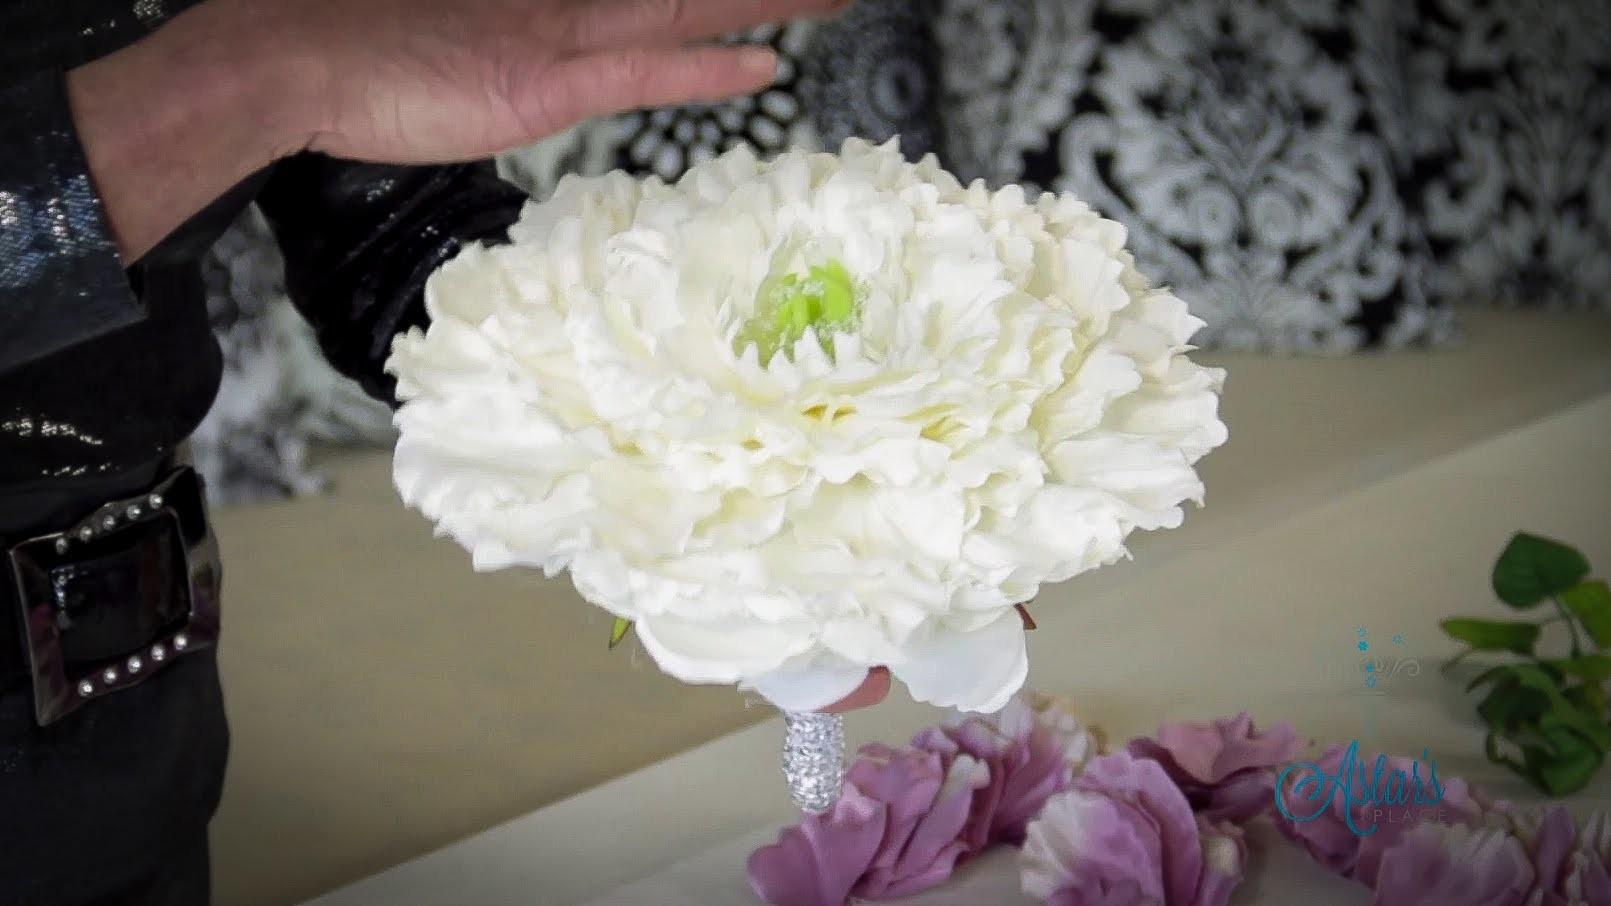 Floristry Tutorial: How to make a Glamelia